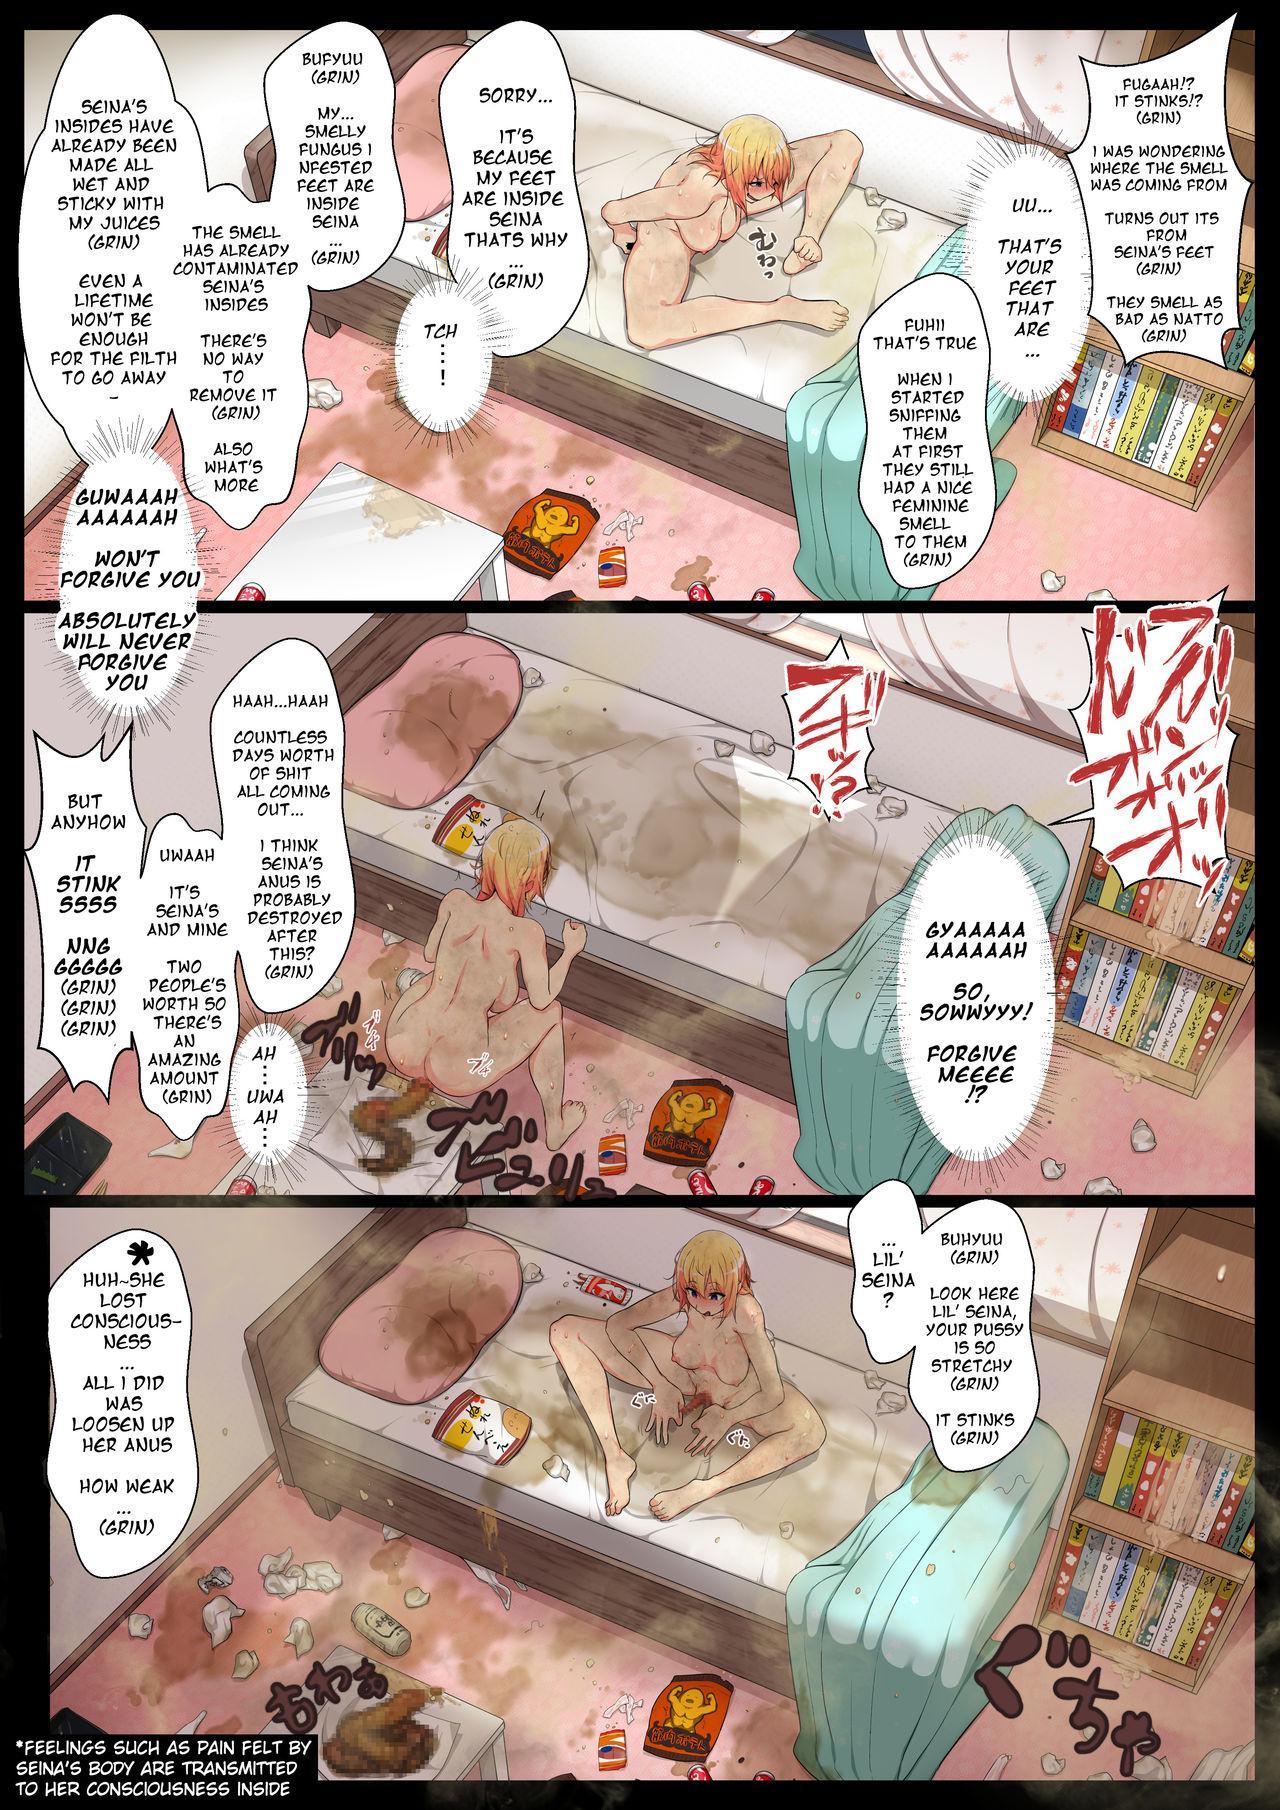 Uchigawa kara Niku o Yogosu 2/Defiling From the Inside 22